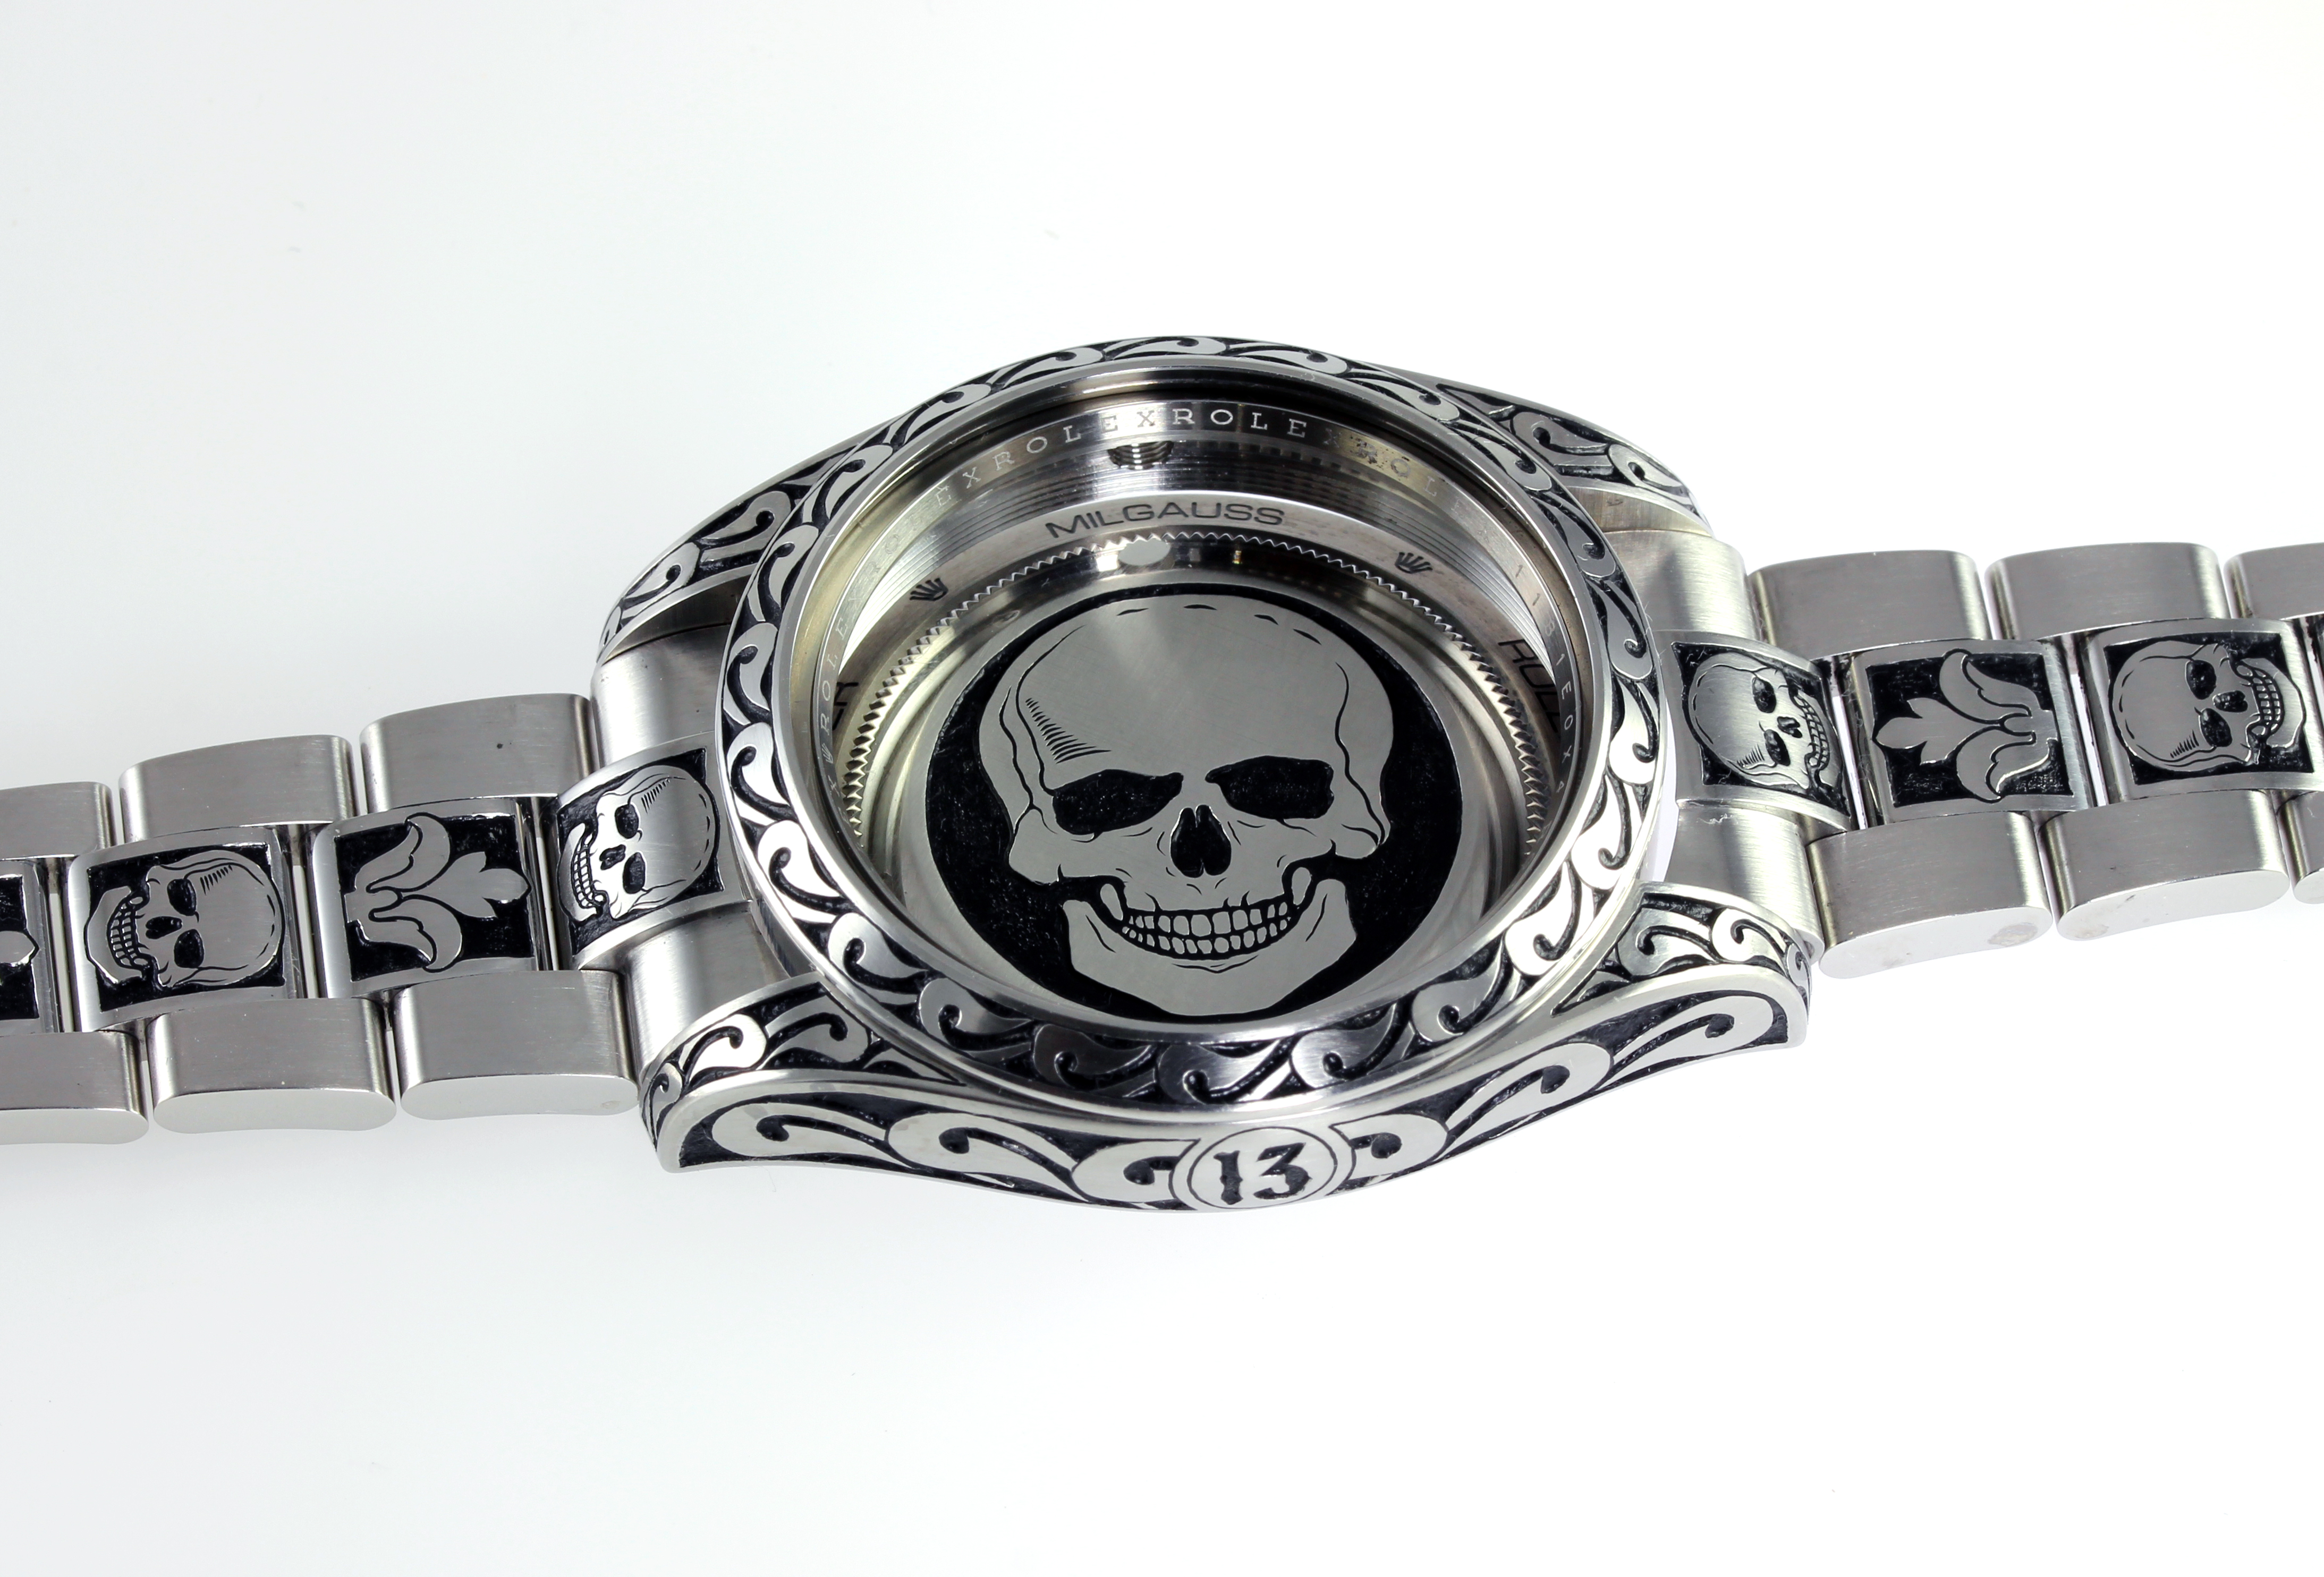 engraved Rolex